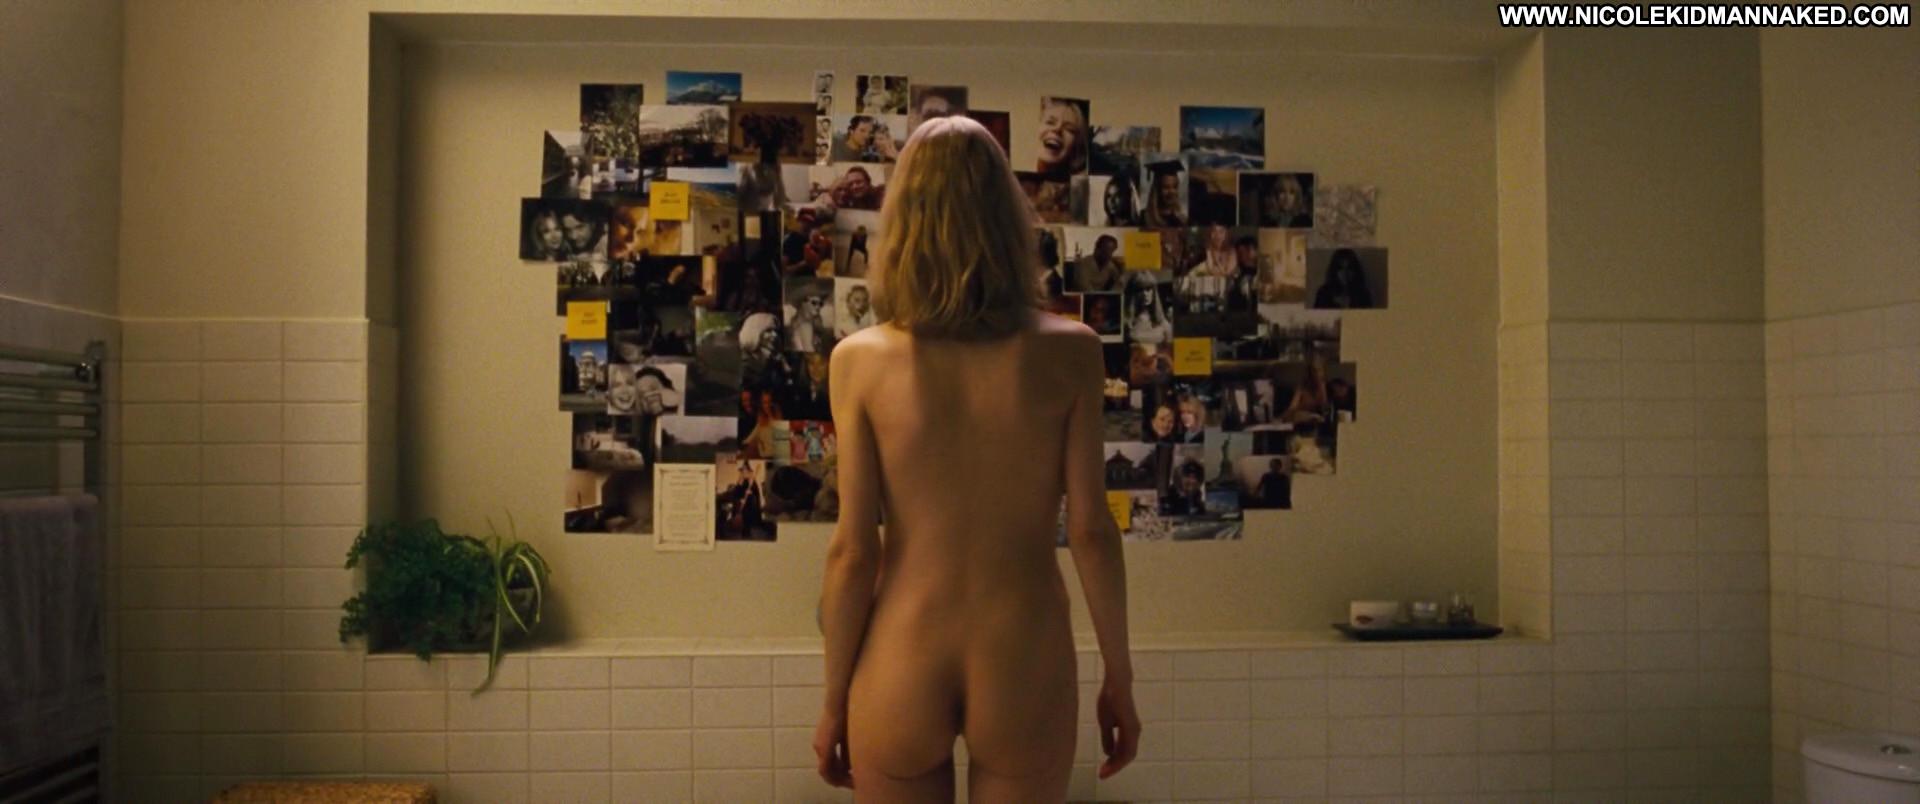 Nicole kidman sex and nudity collection 2